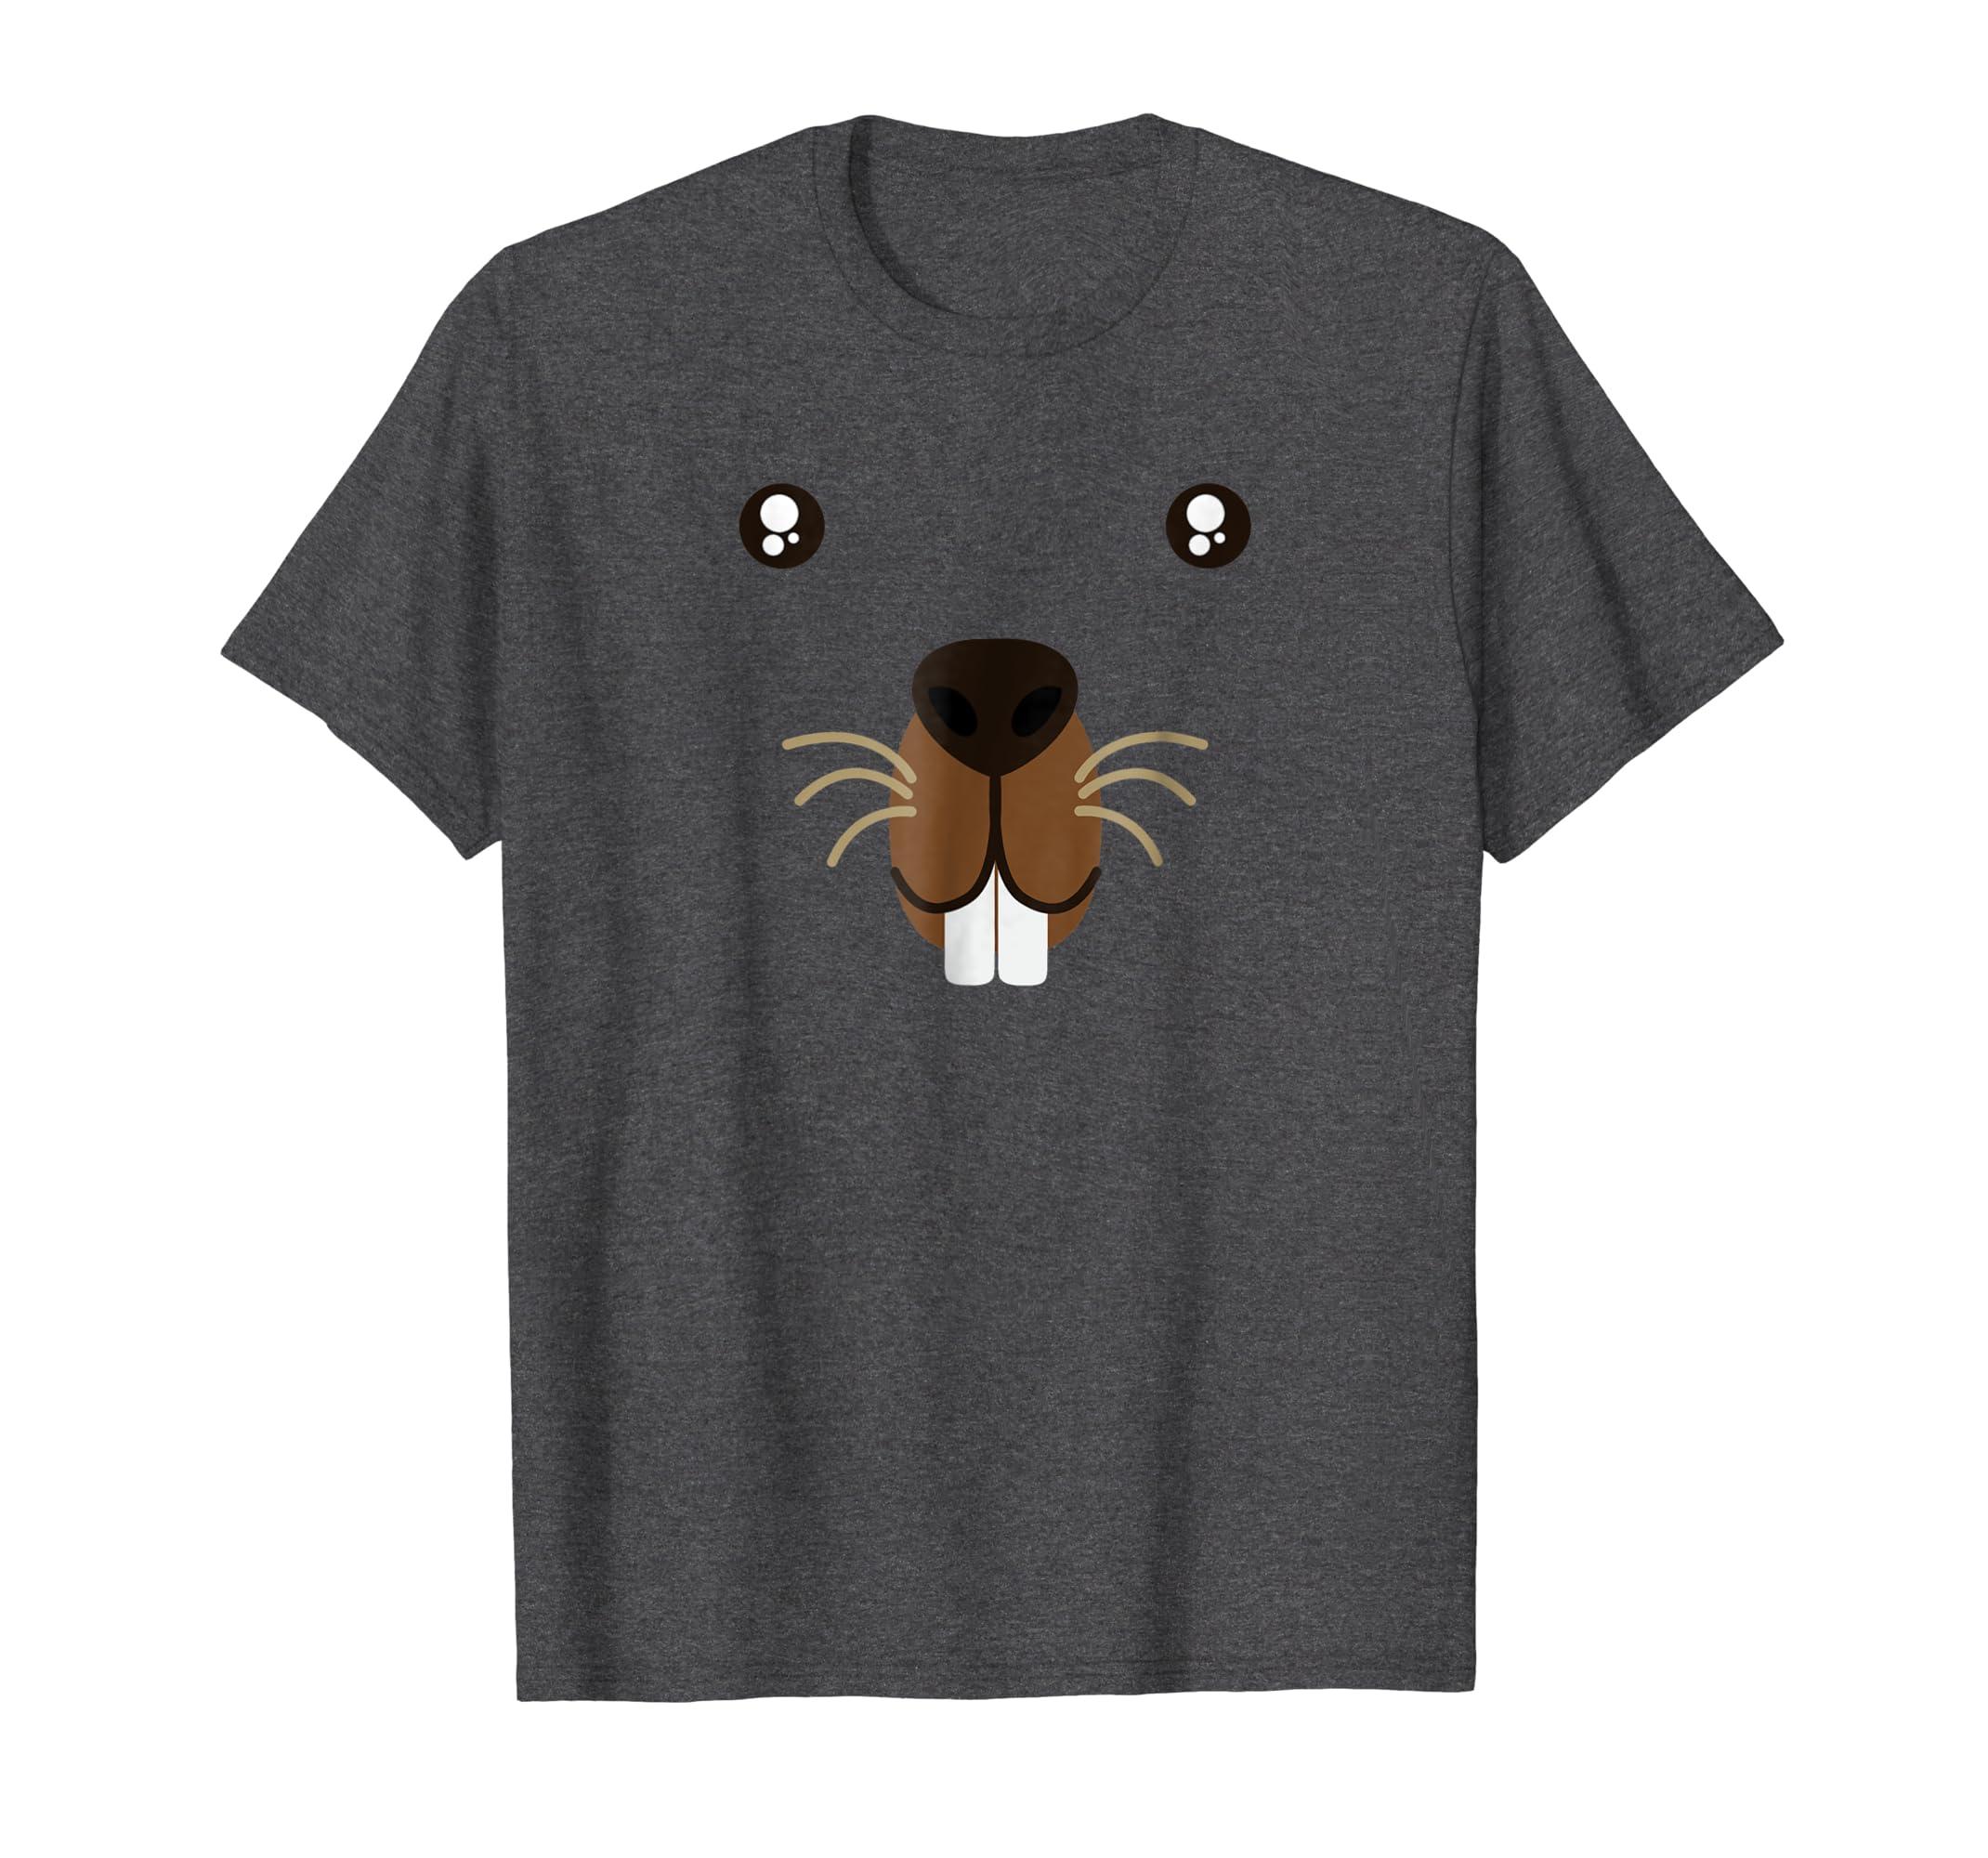 e9f32158eacd Amazon.com: Groundhog Day Beaver Cute Animal Face Costume T-Shirt: Clothing